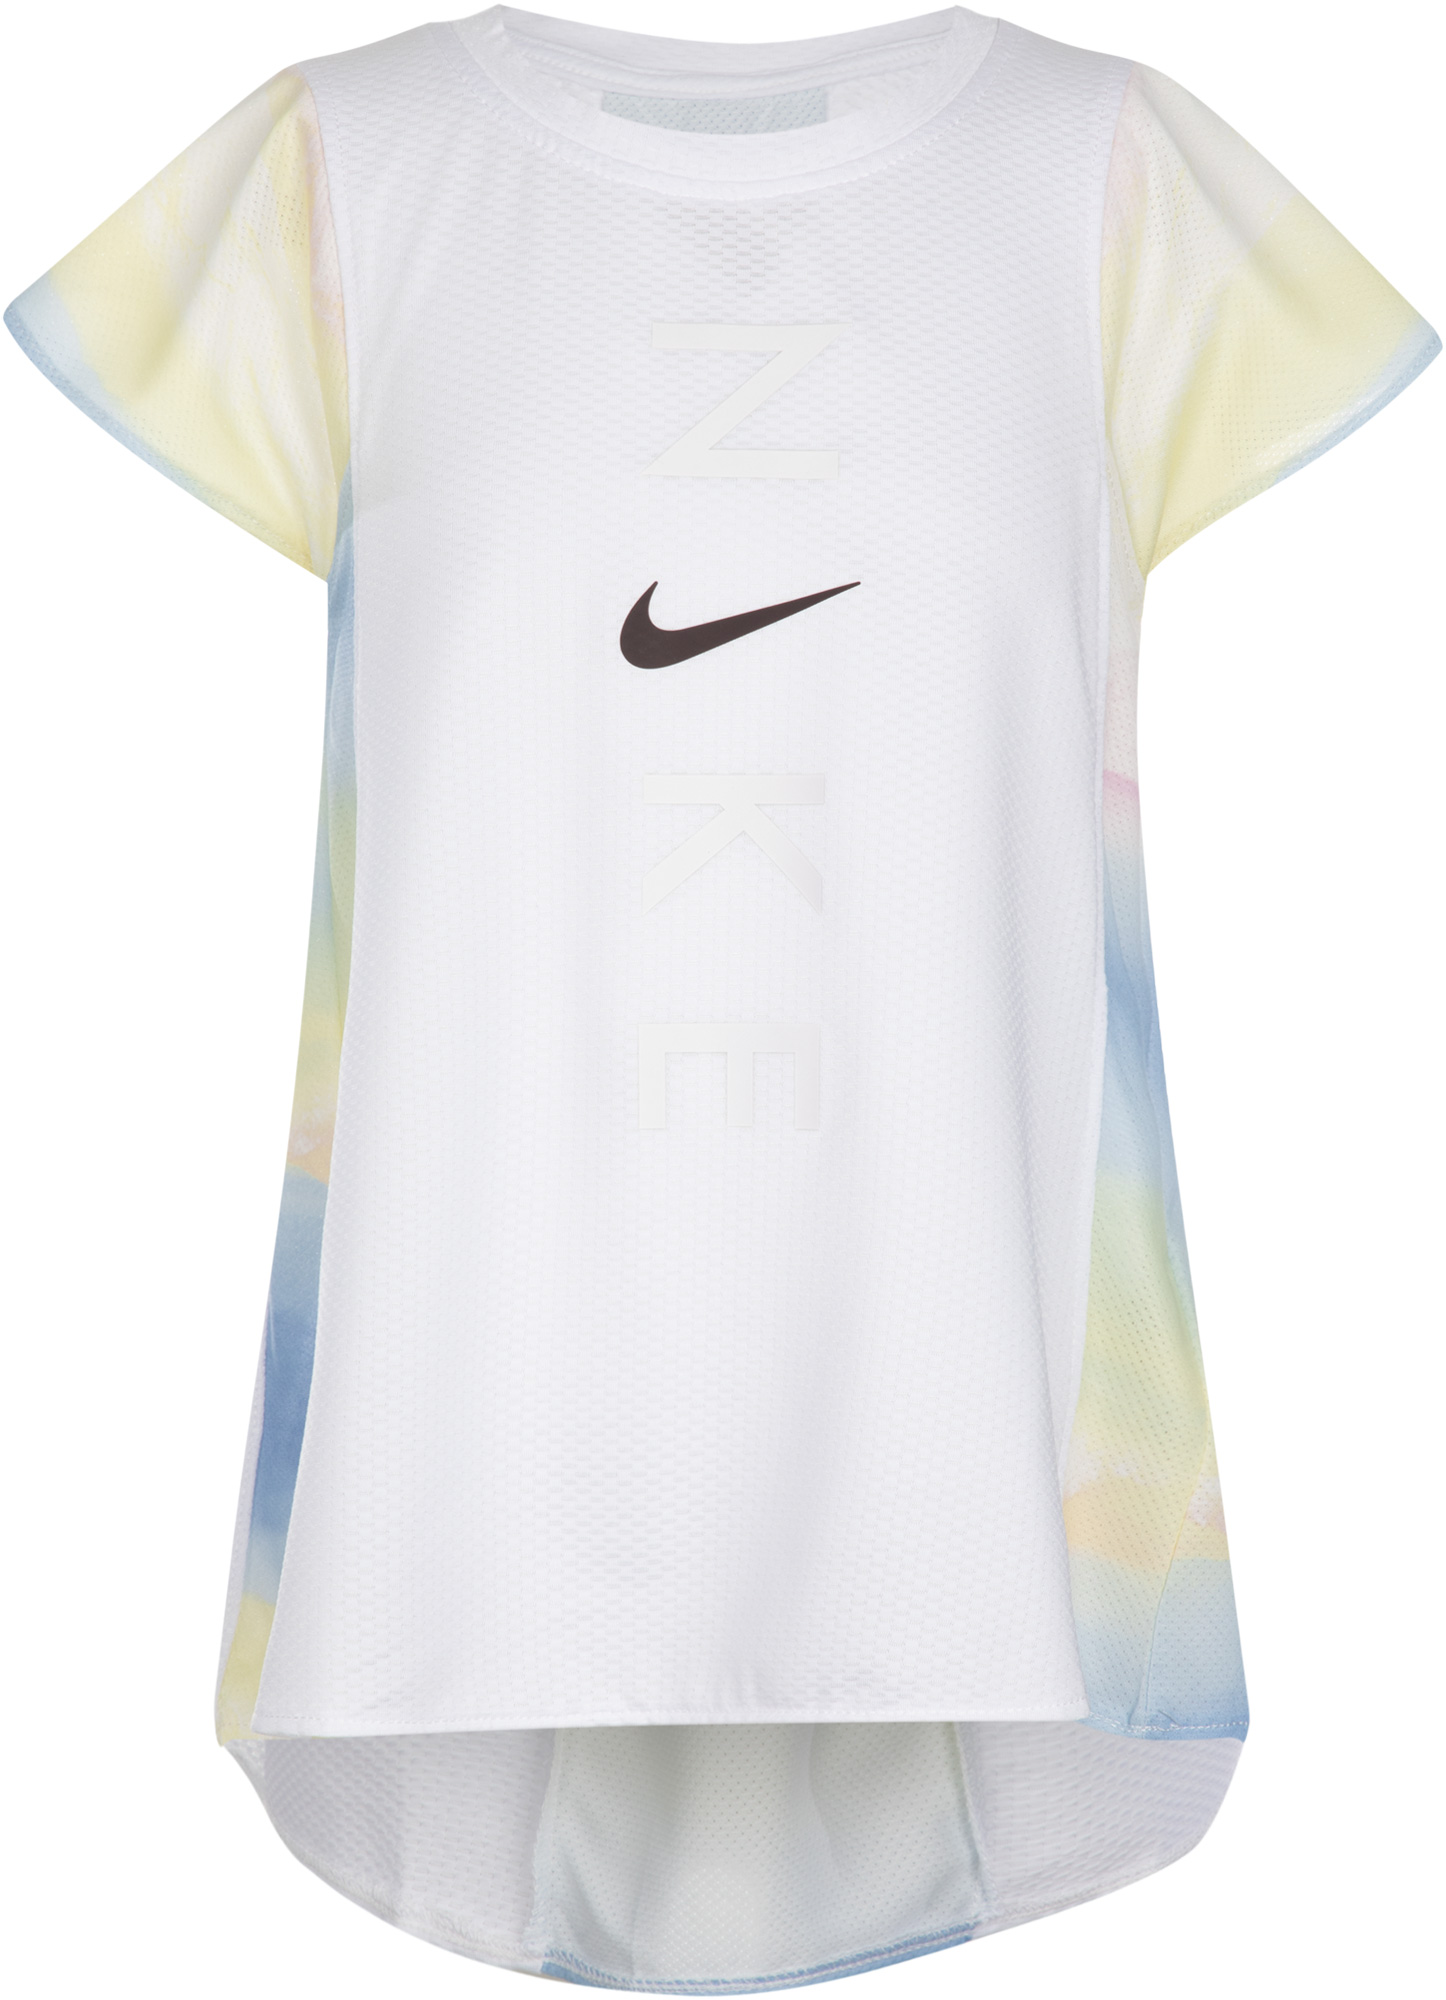 Nike Футболка для девочек Nike Dry Instacool, размер 116